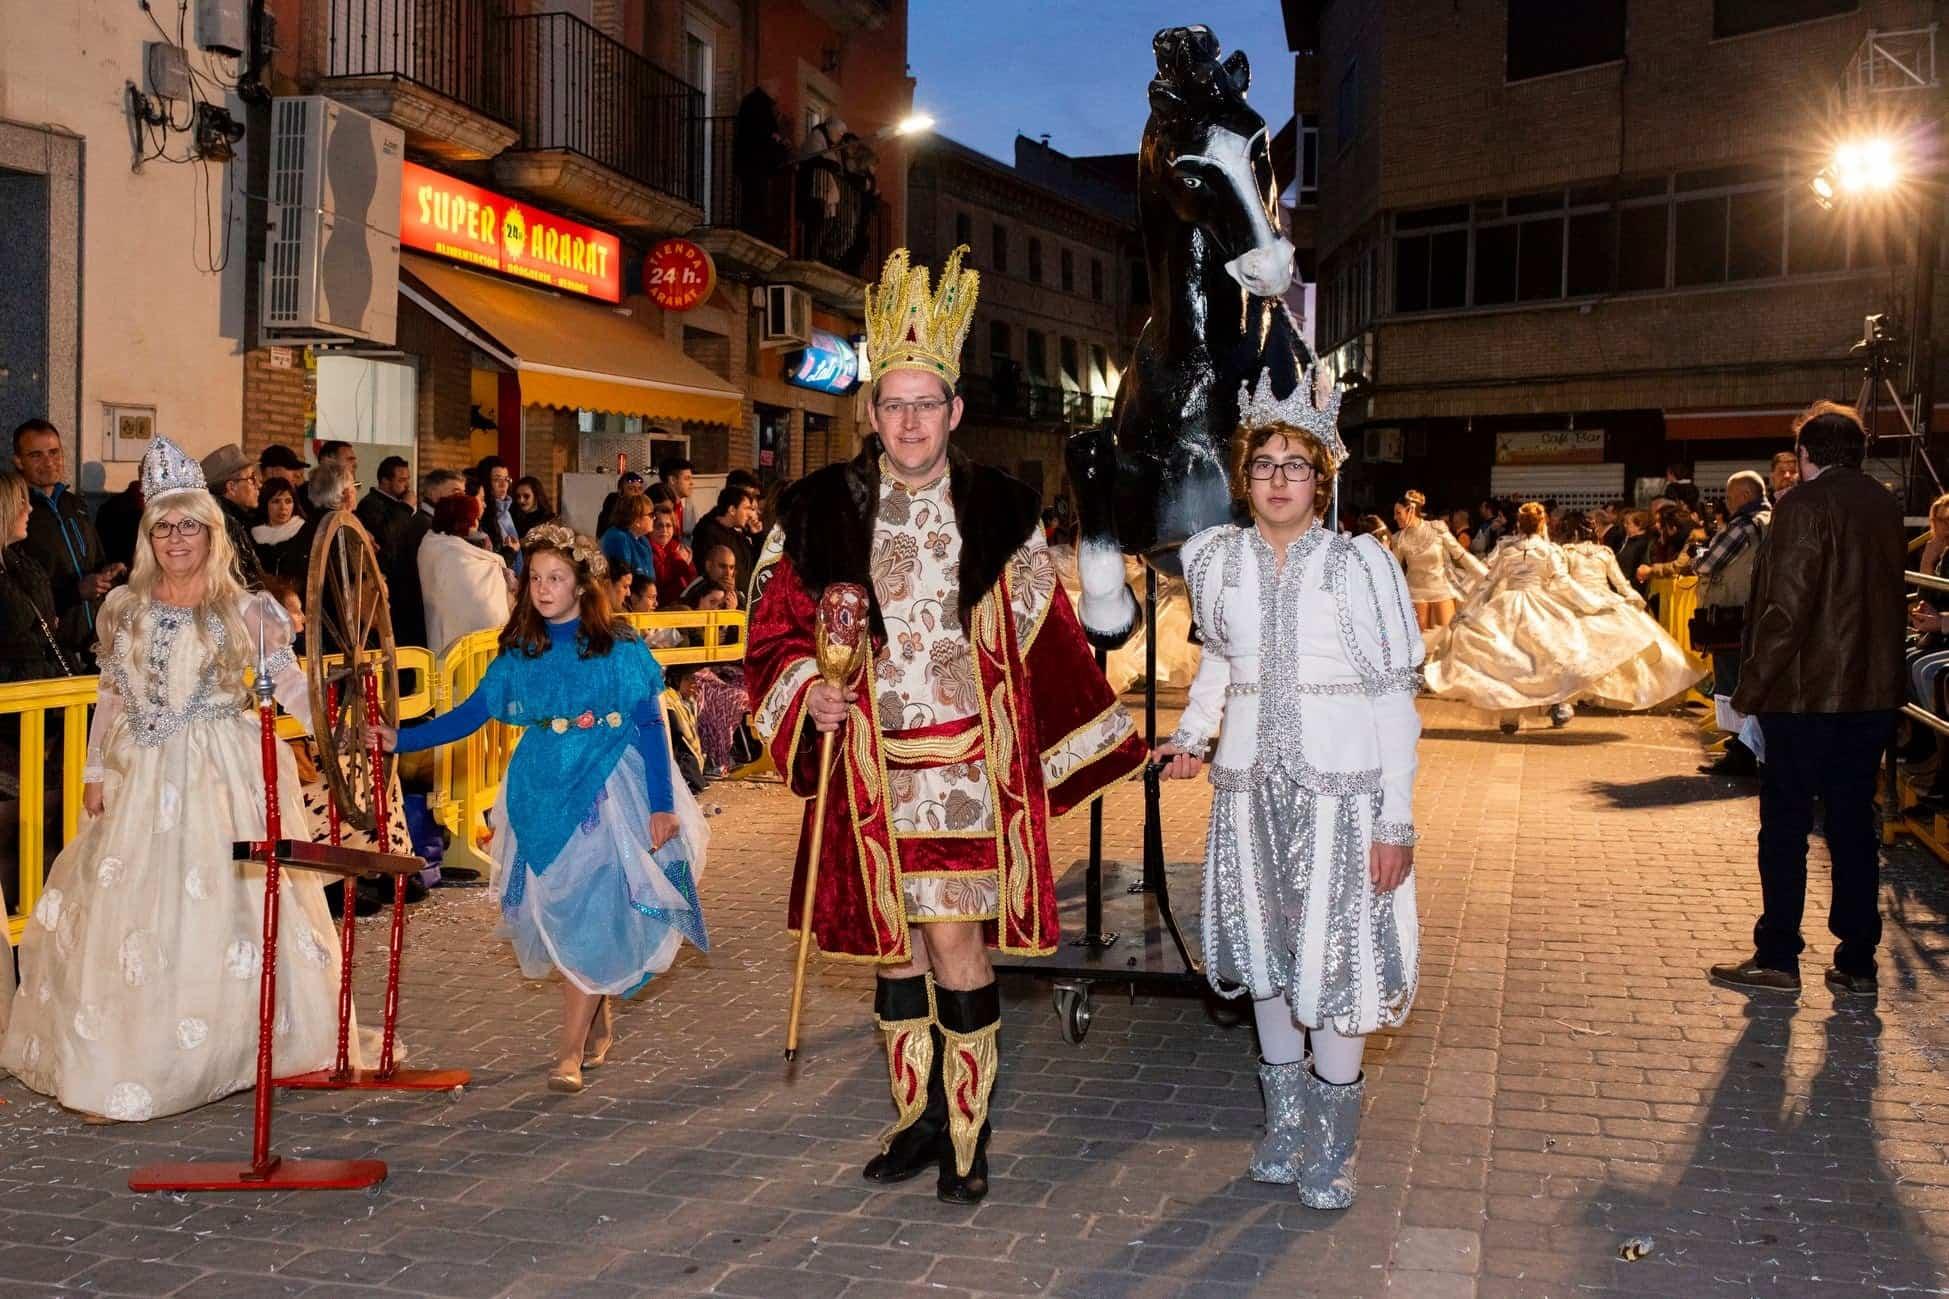 Carnaval de herencia 2020 ofertorio 150 - Selección de fotografías del Ofertorio del Carnaval de Herencia